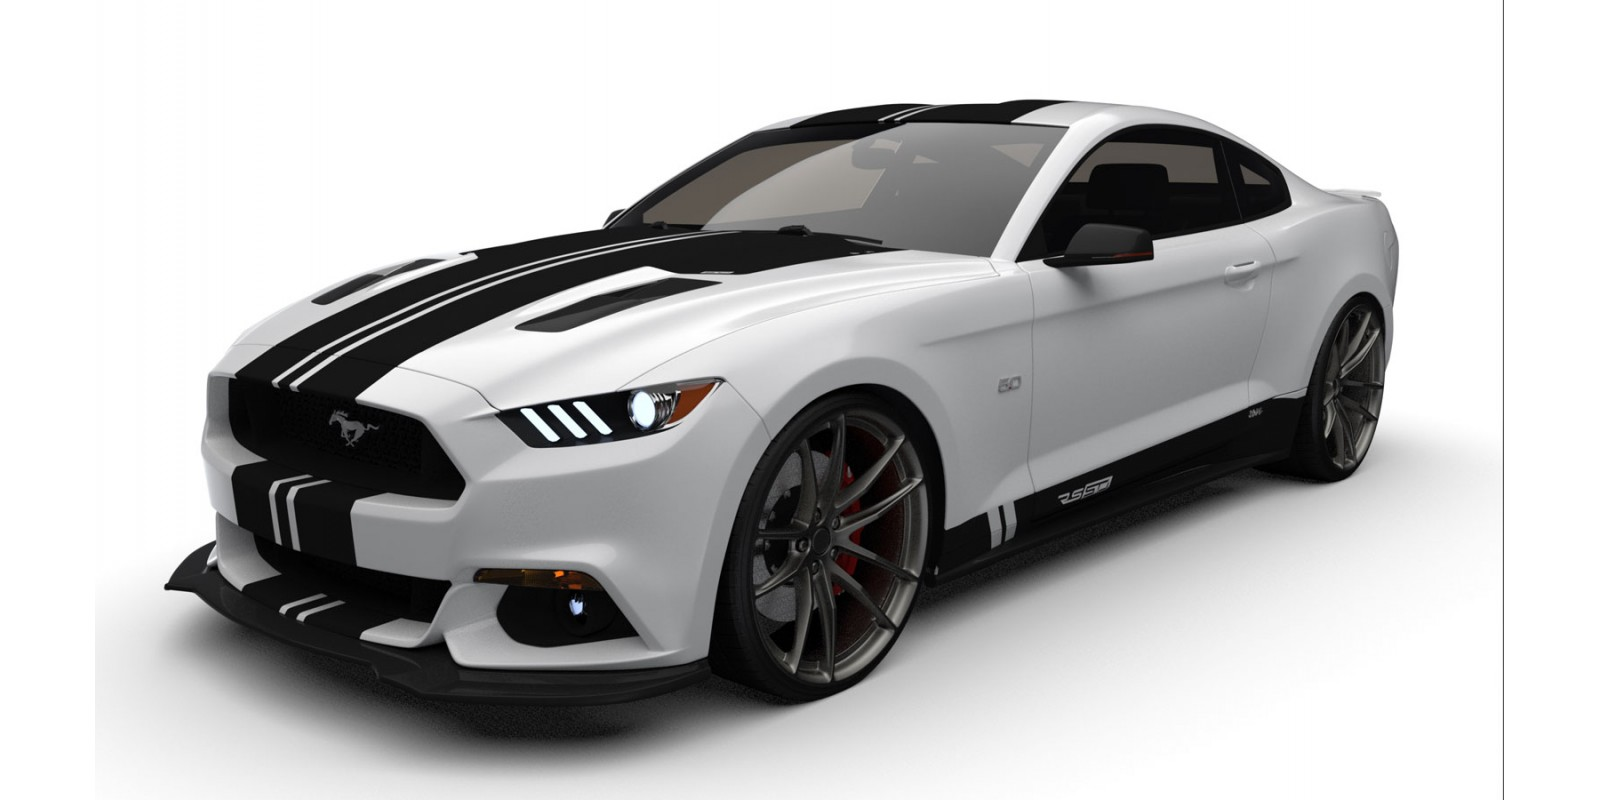 Raceskinz® 2015-2017 Mustang RS50 D3NiAl™ Edition Premium Graphics Kit